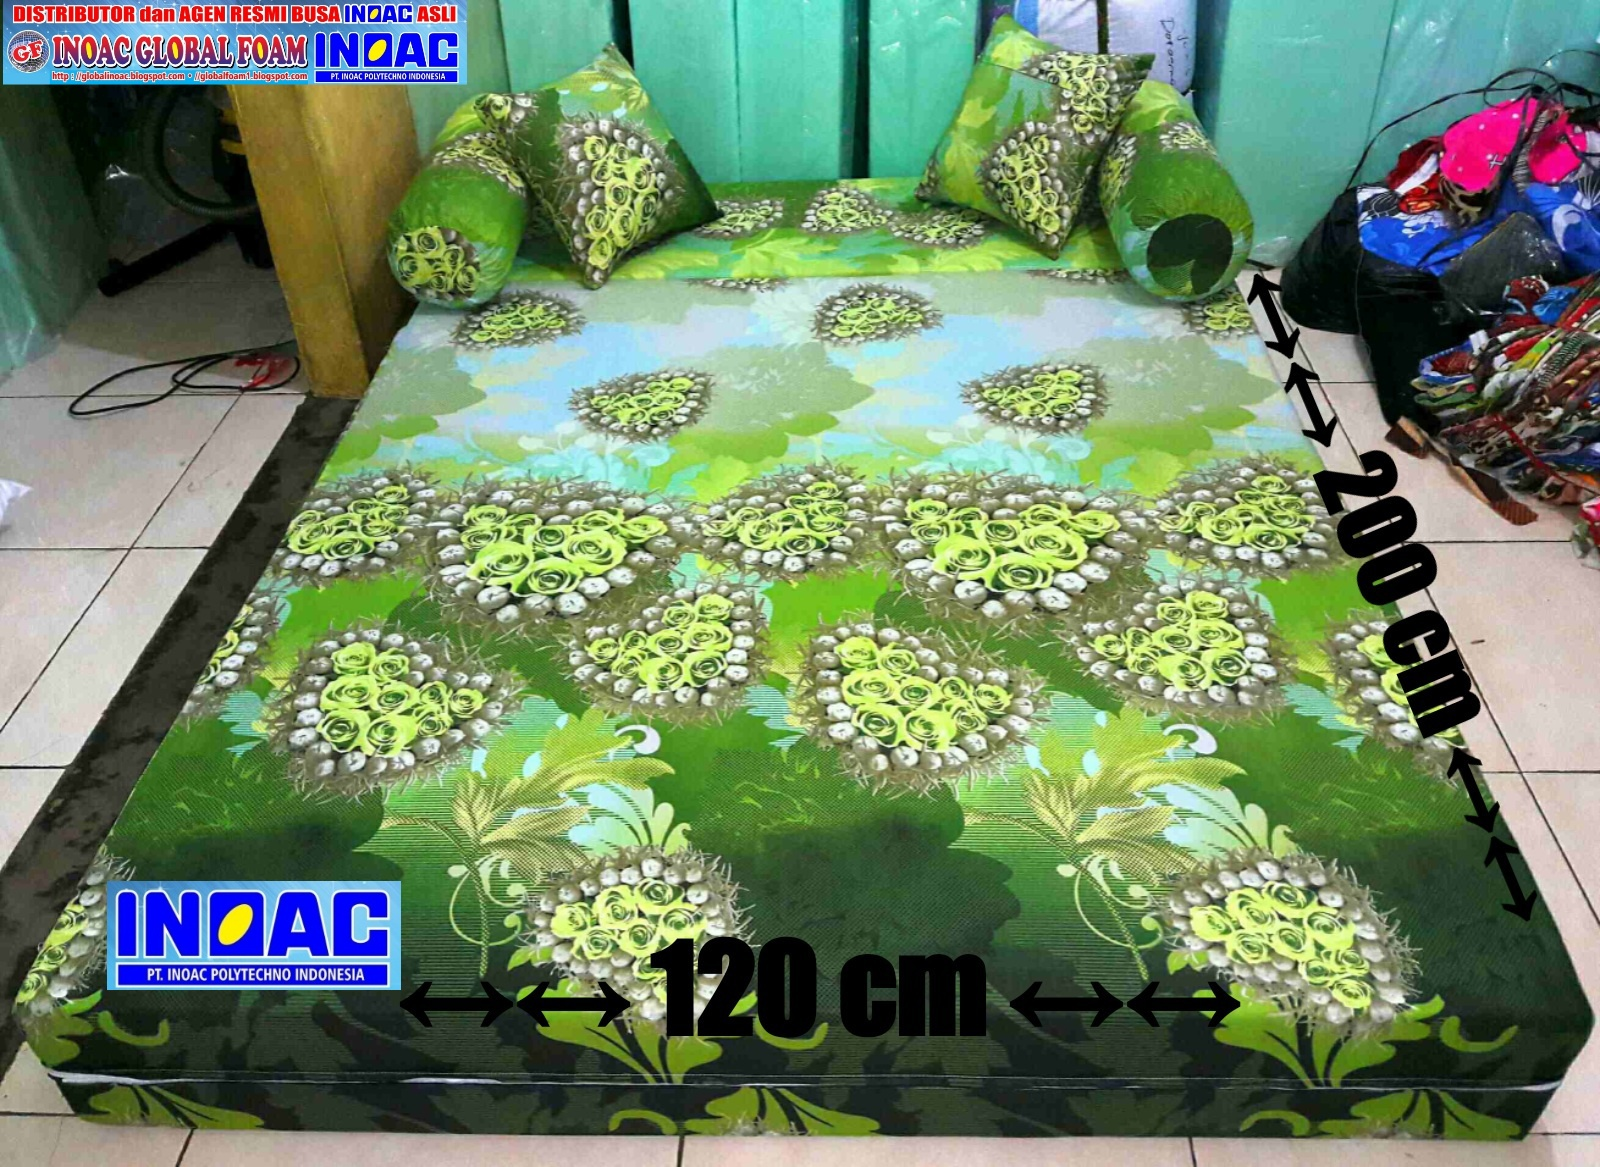 Harga Sofa Bed Inoac No 1 Buy New York Kasur 2019 Distributor Dan Agen Resmi